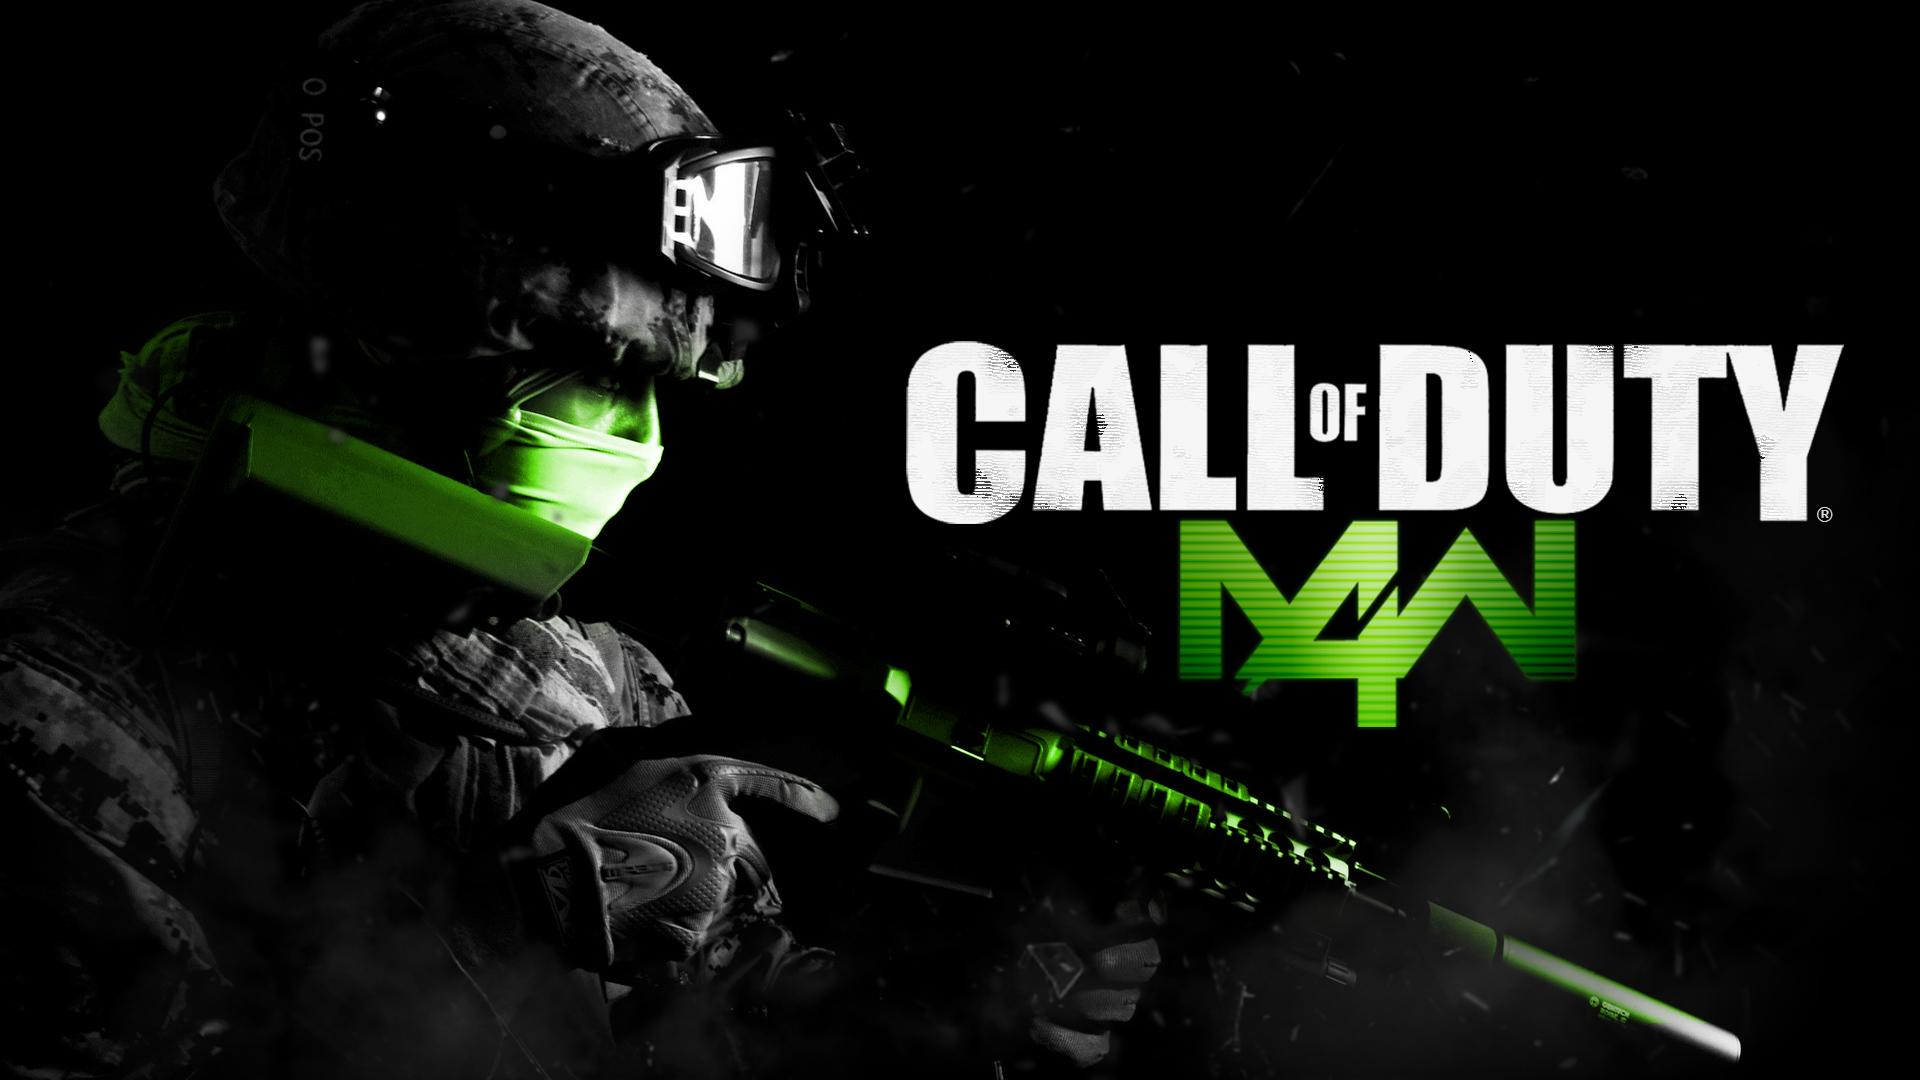 Modern Warfare Wallpaper Hd Call Of Duty Modern Warfare 4 Game Wallpapers Hd